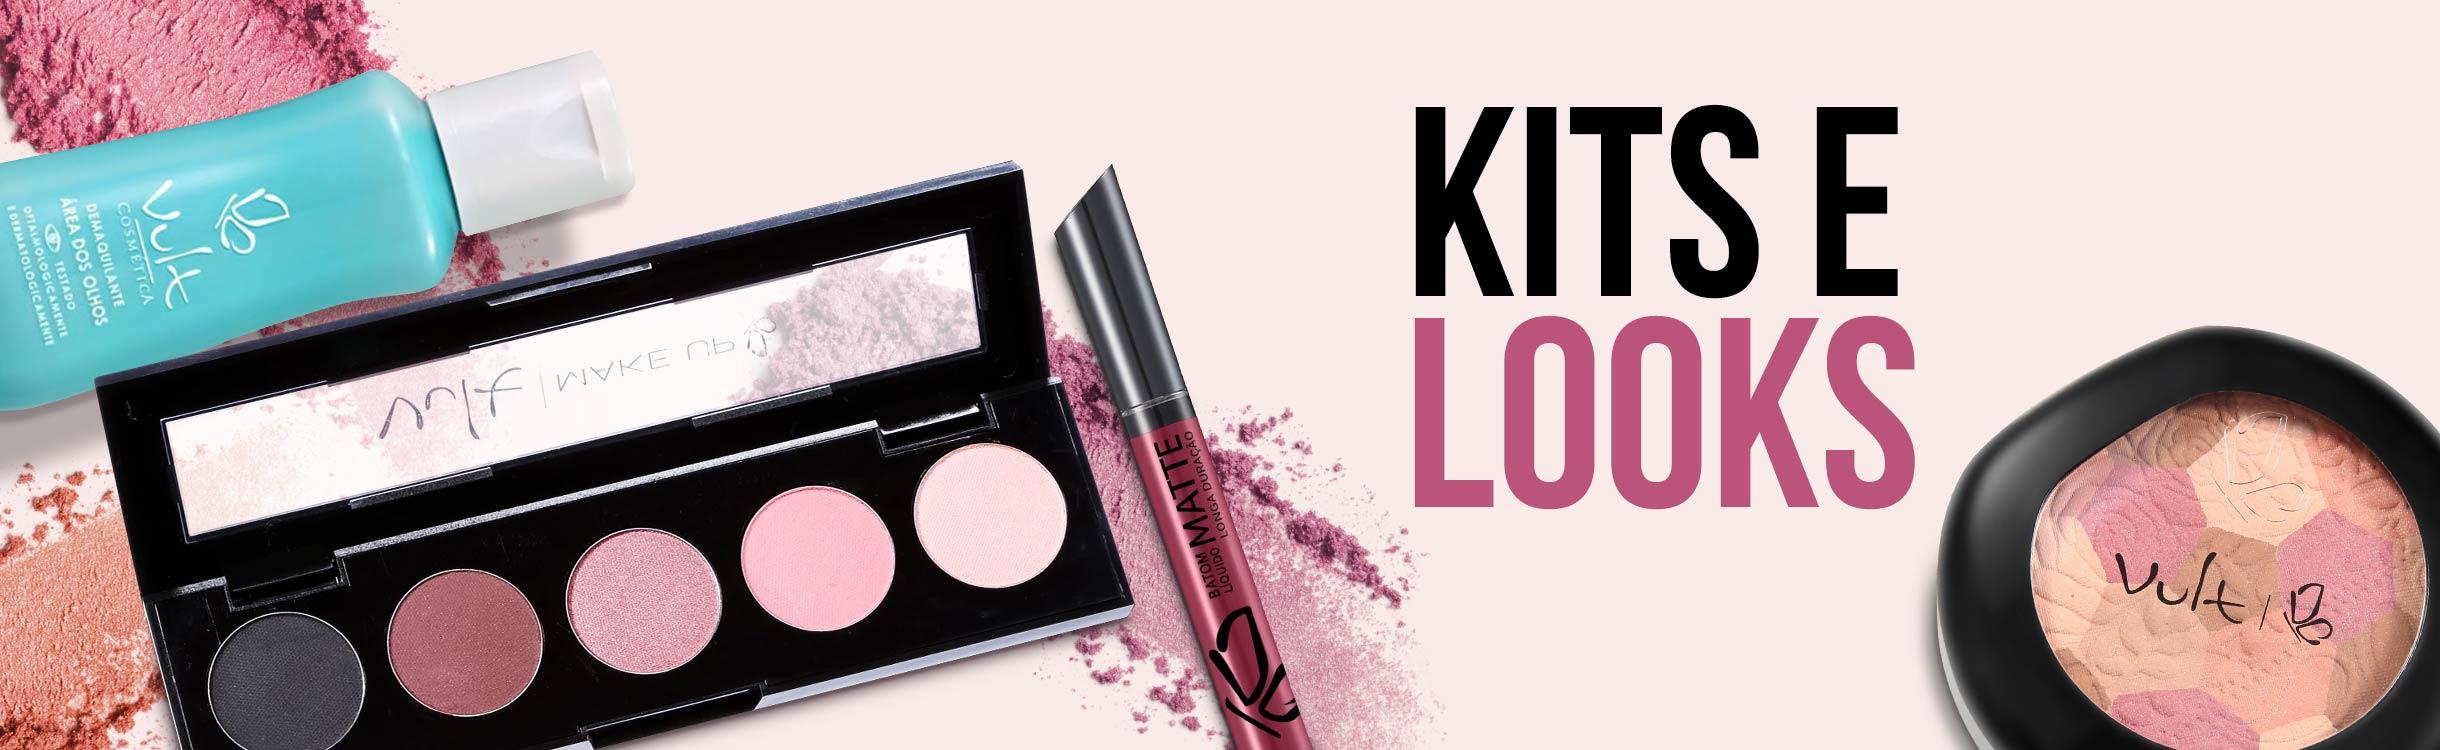 Kits e looks de Maquiagem Vult